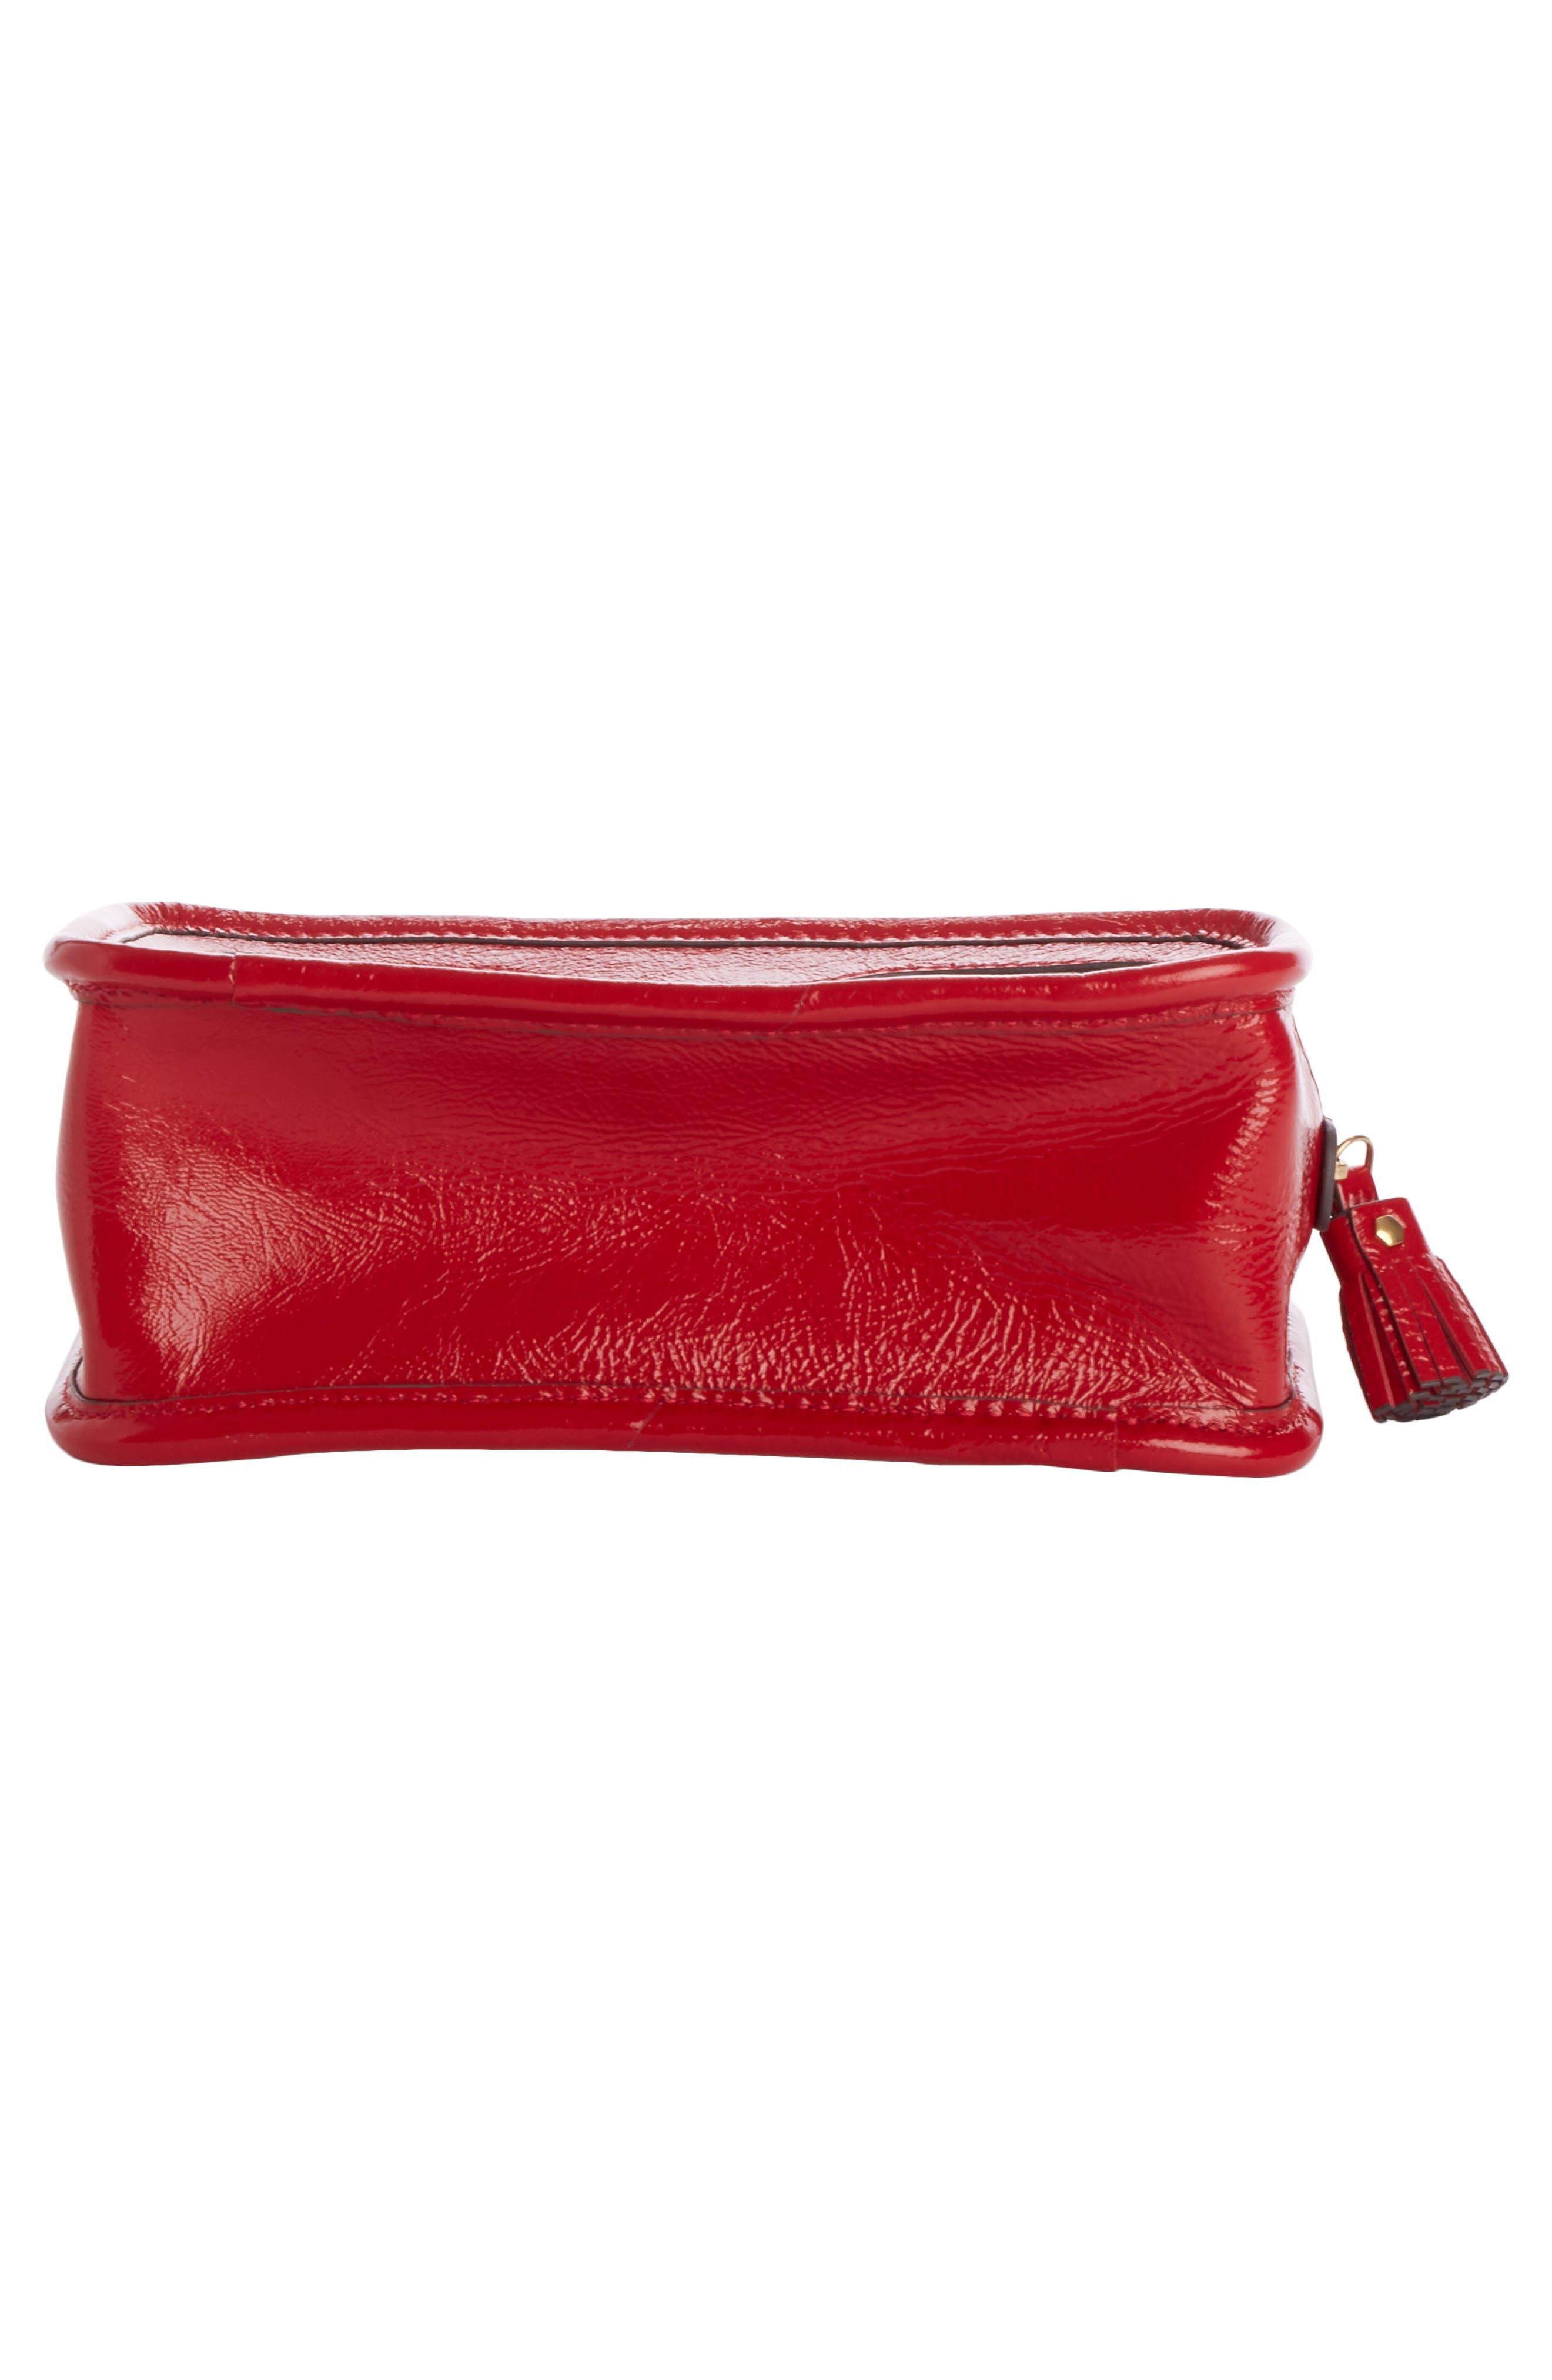 Rainy Day Cosmetic Bag,                             Alternate thumbnail 4, color,                             600